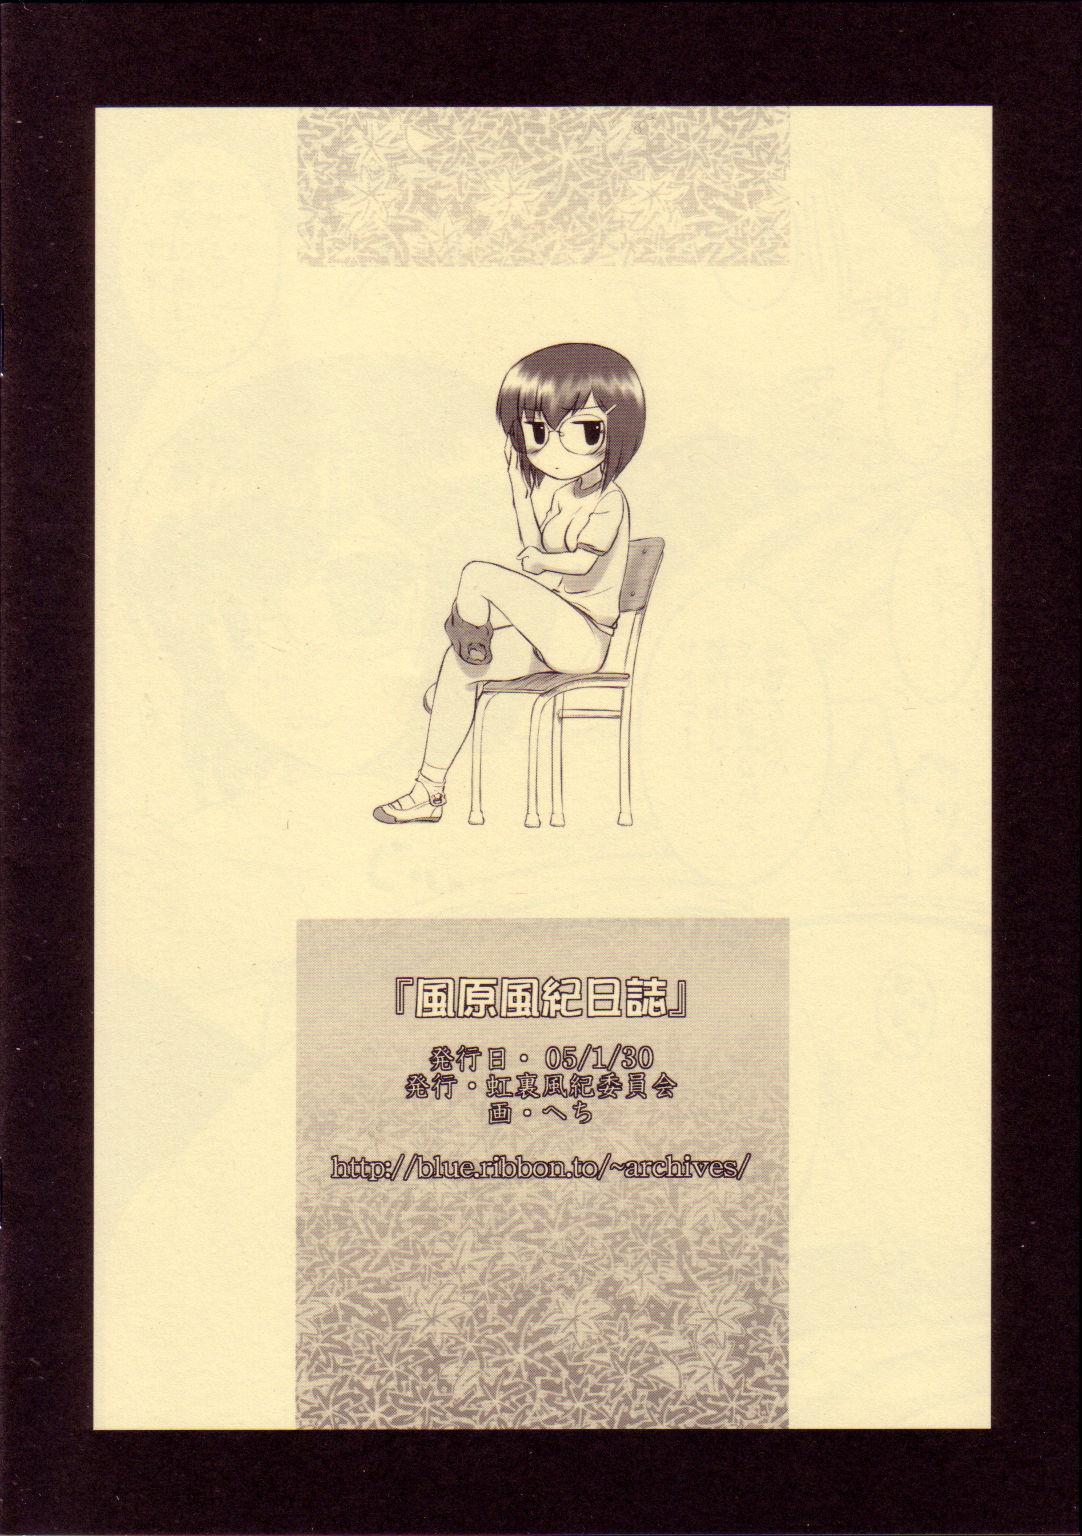 Kazahara Fuuki Nisshi 10